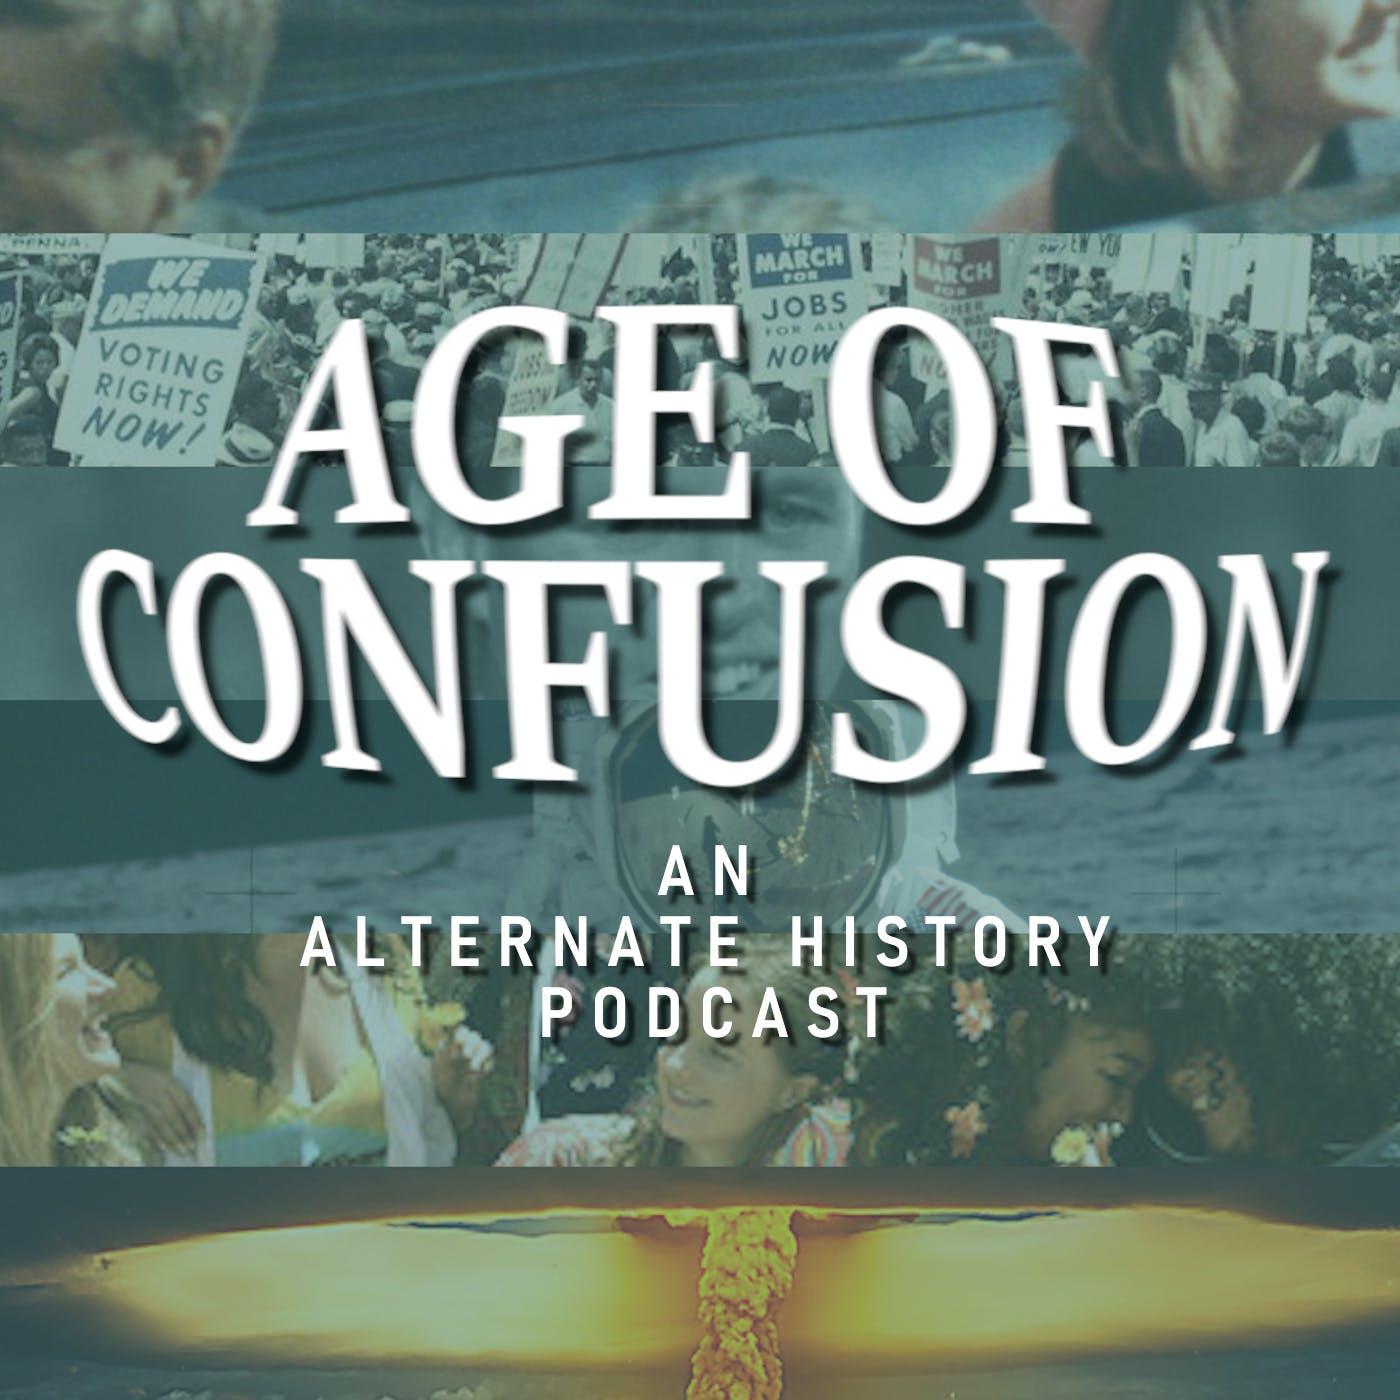 Bonus: Trailer for Age of Confusion Podcast